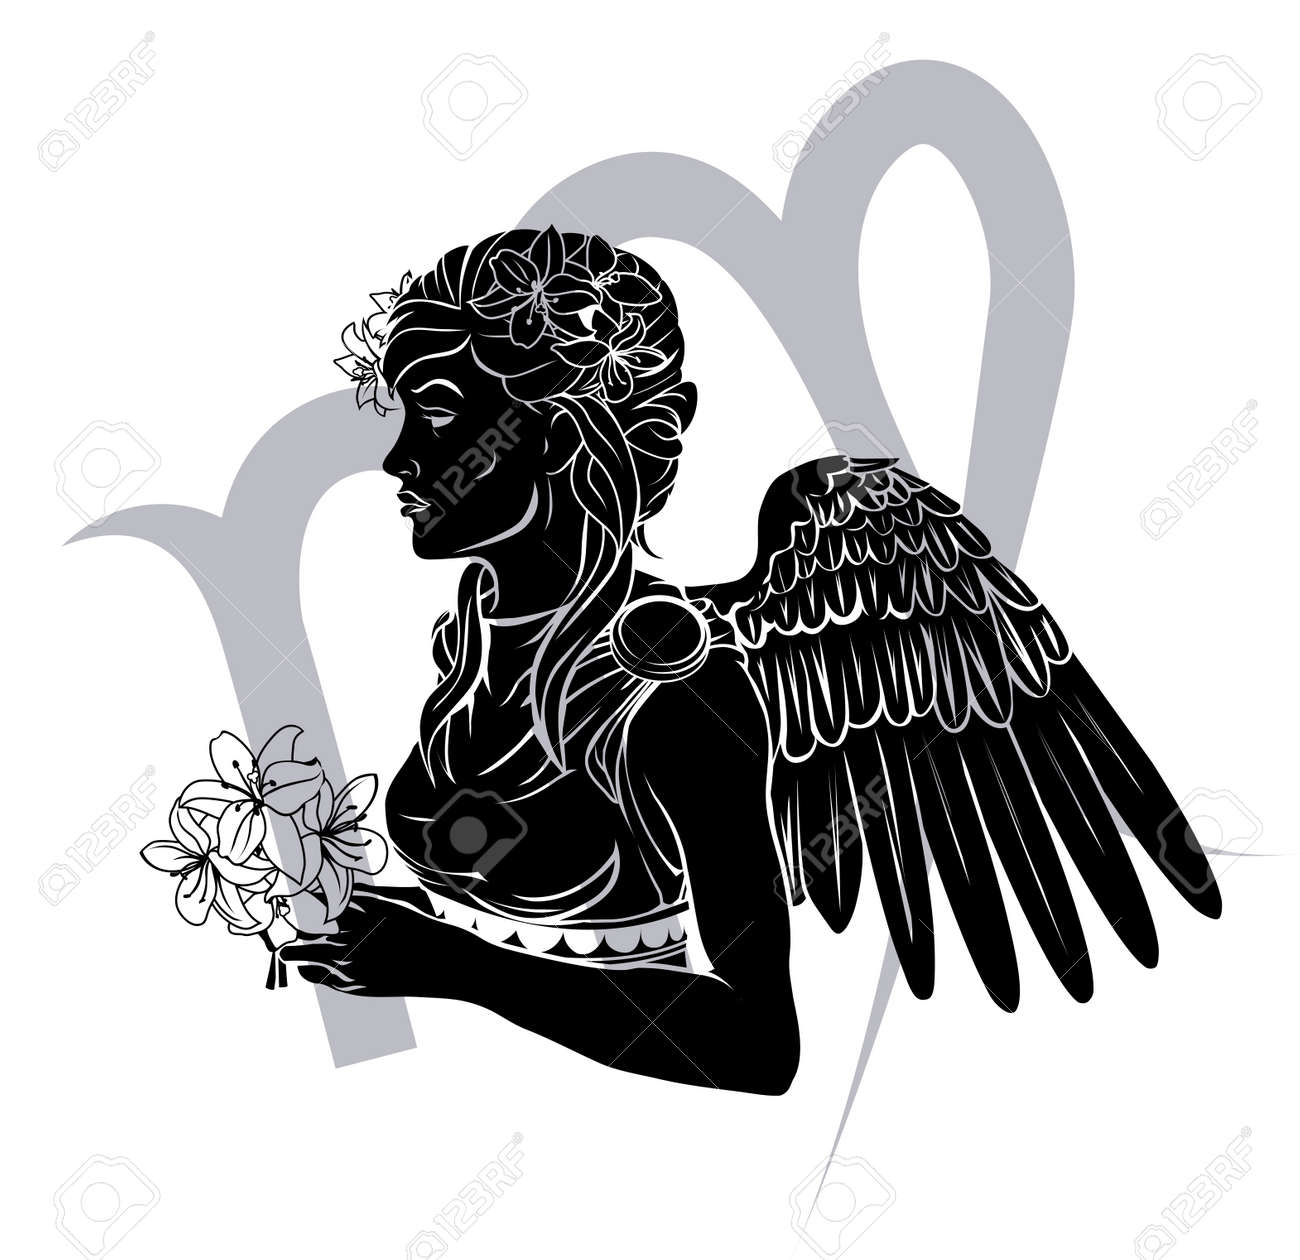 Illustration of Virgo the virgin zodiac horoscope Stock Vector - 17682766